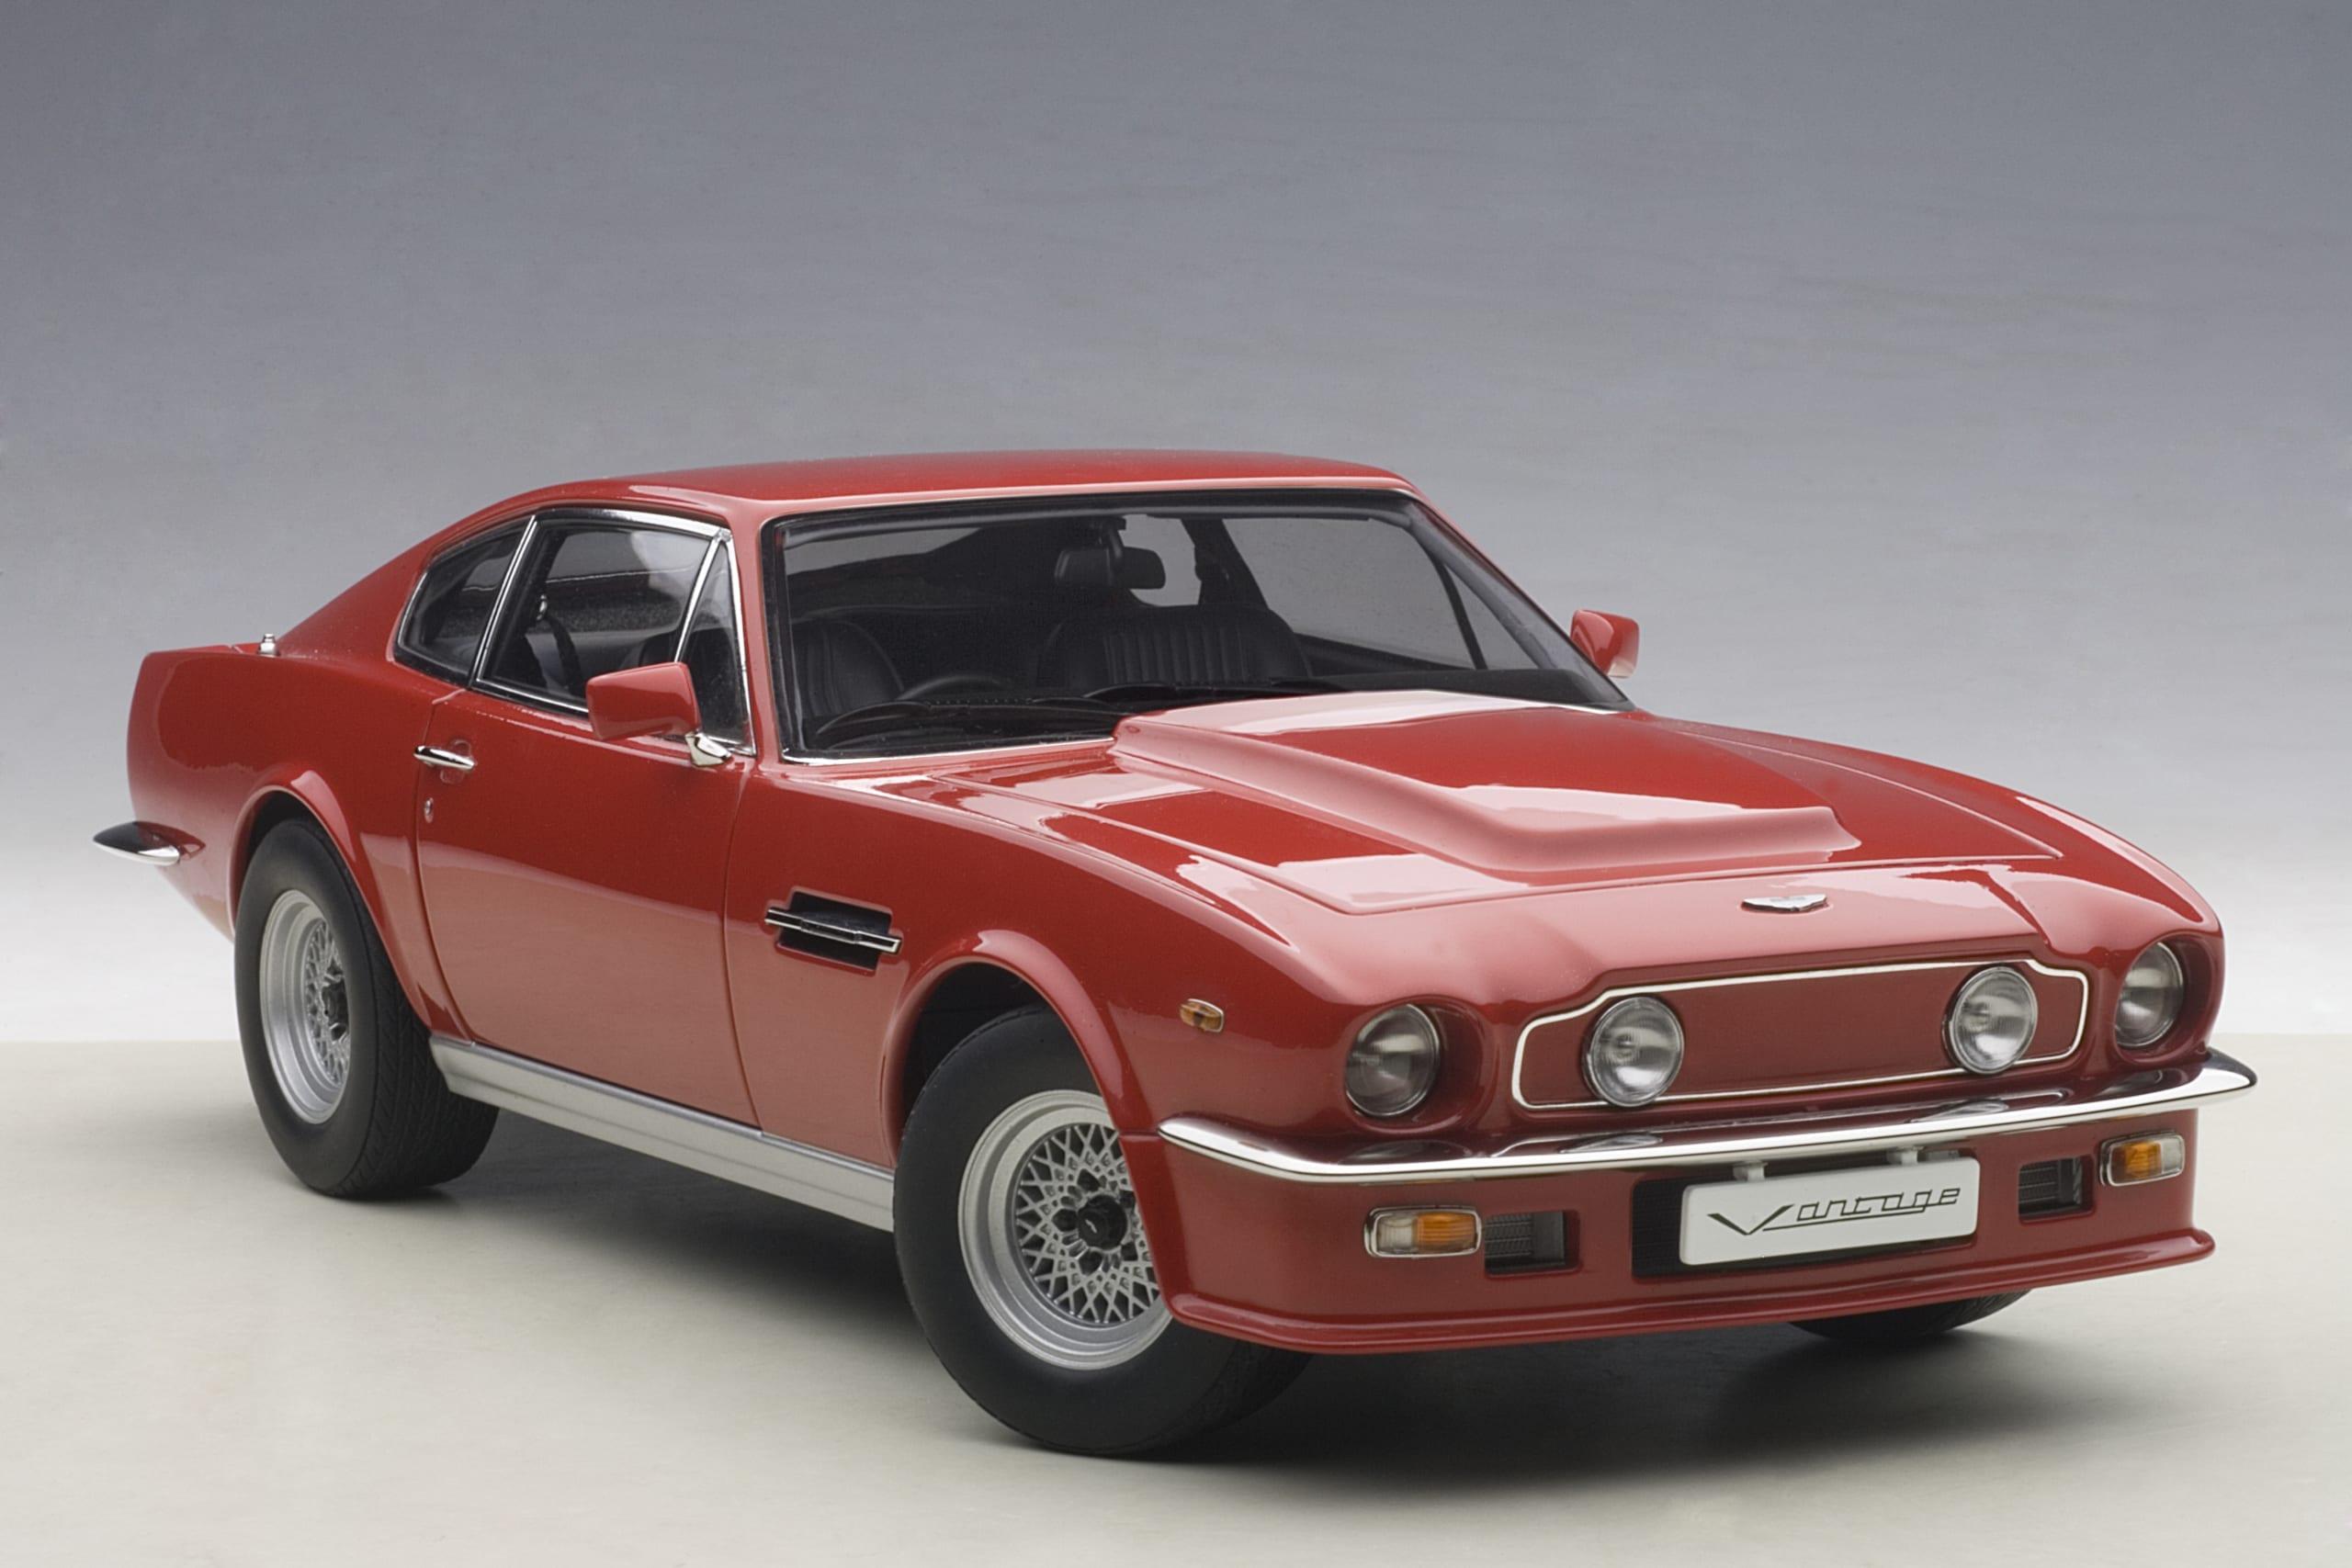 Aston Martin V8 Vantage 1985 Suffolk Red Autoart